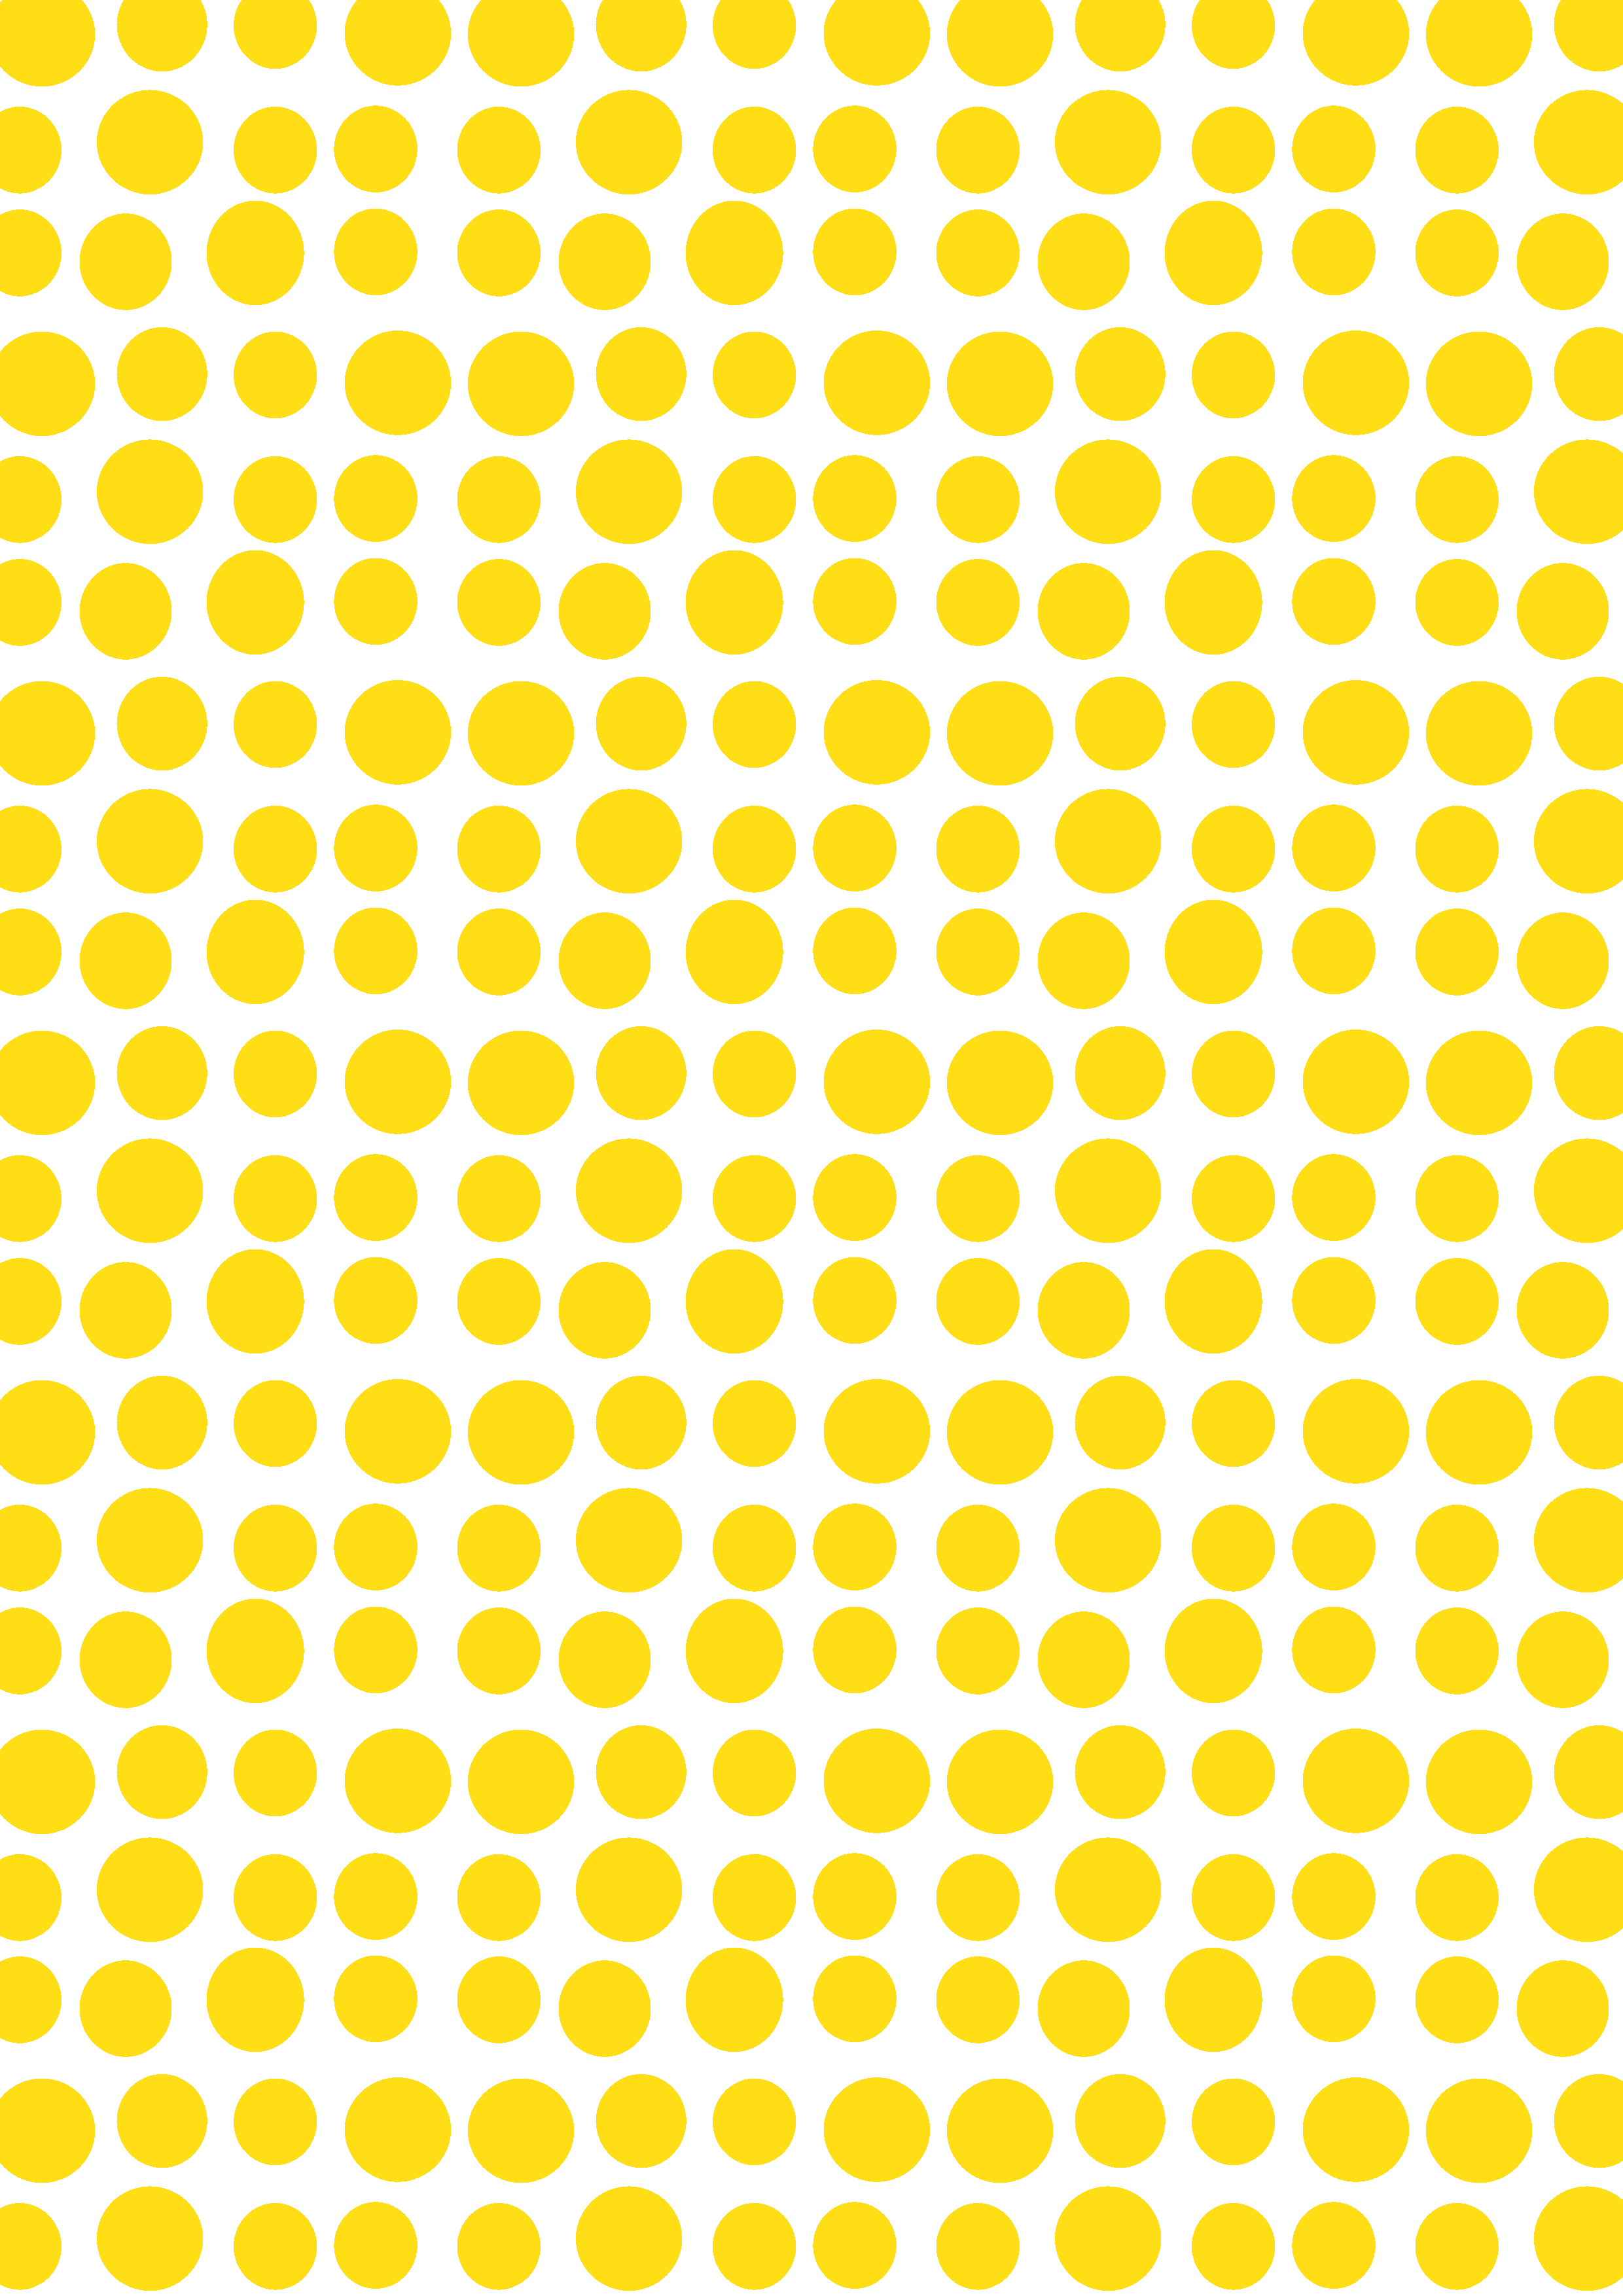 Yellow Dots Design Pattern Art Yellow Wallpaper Polka Dot Background